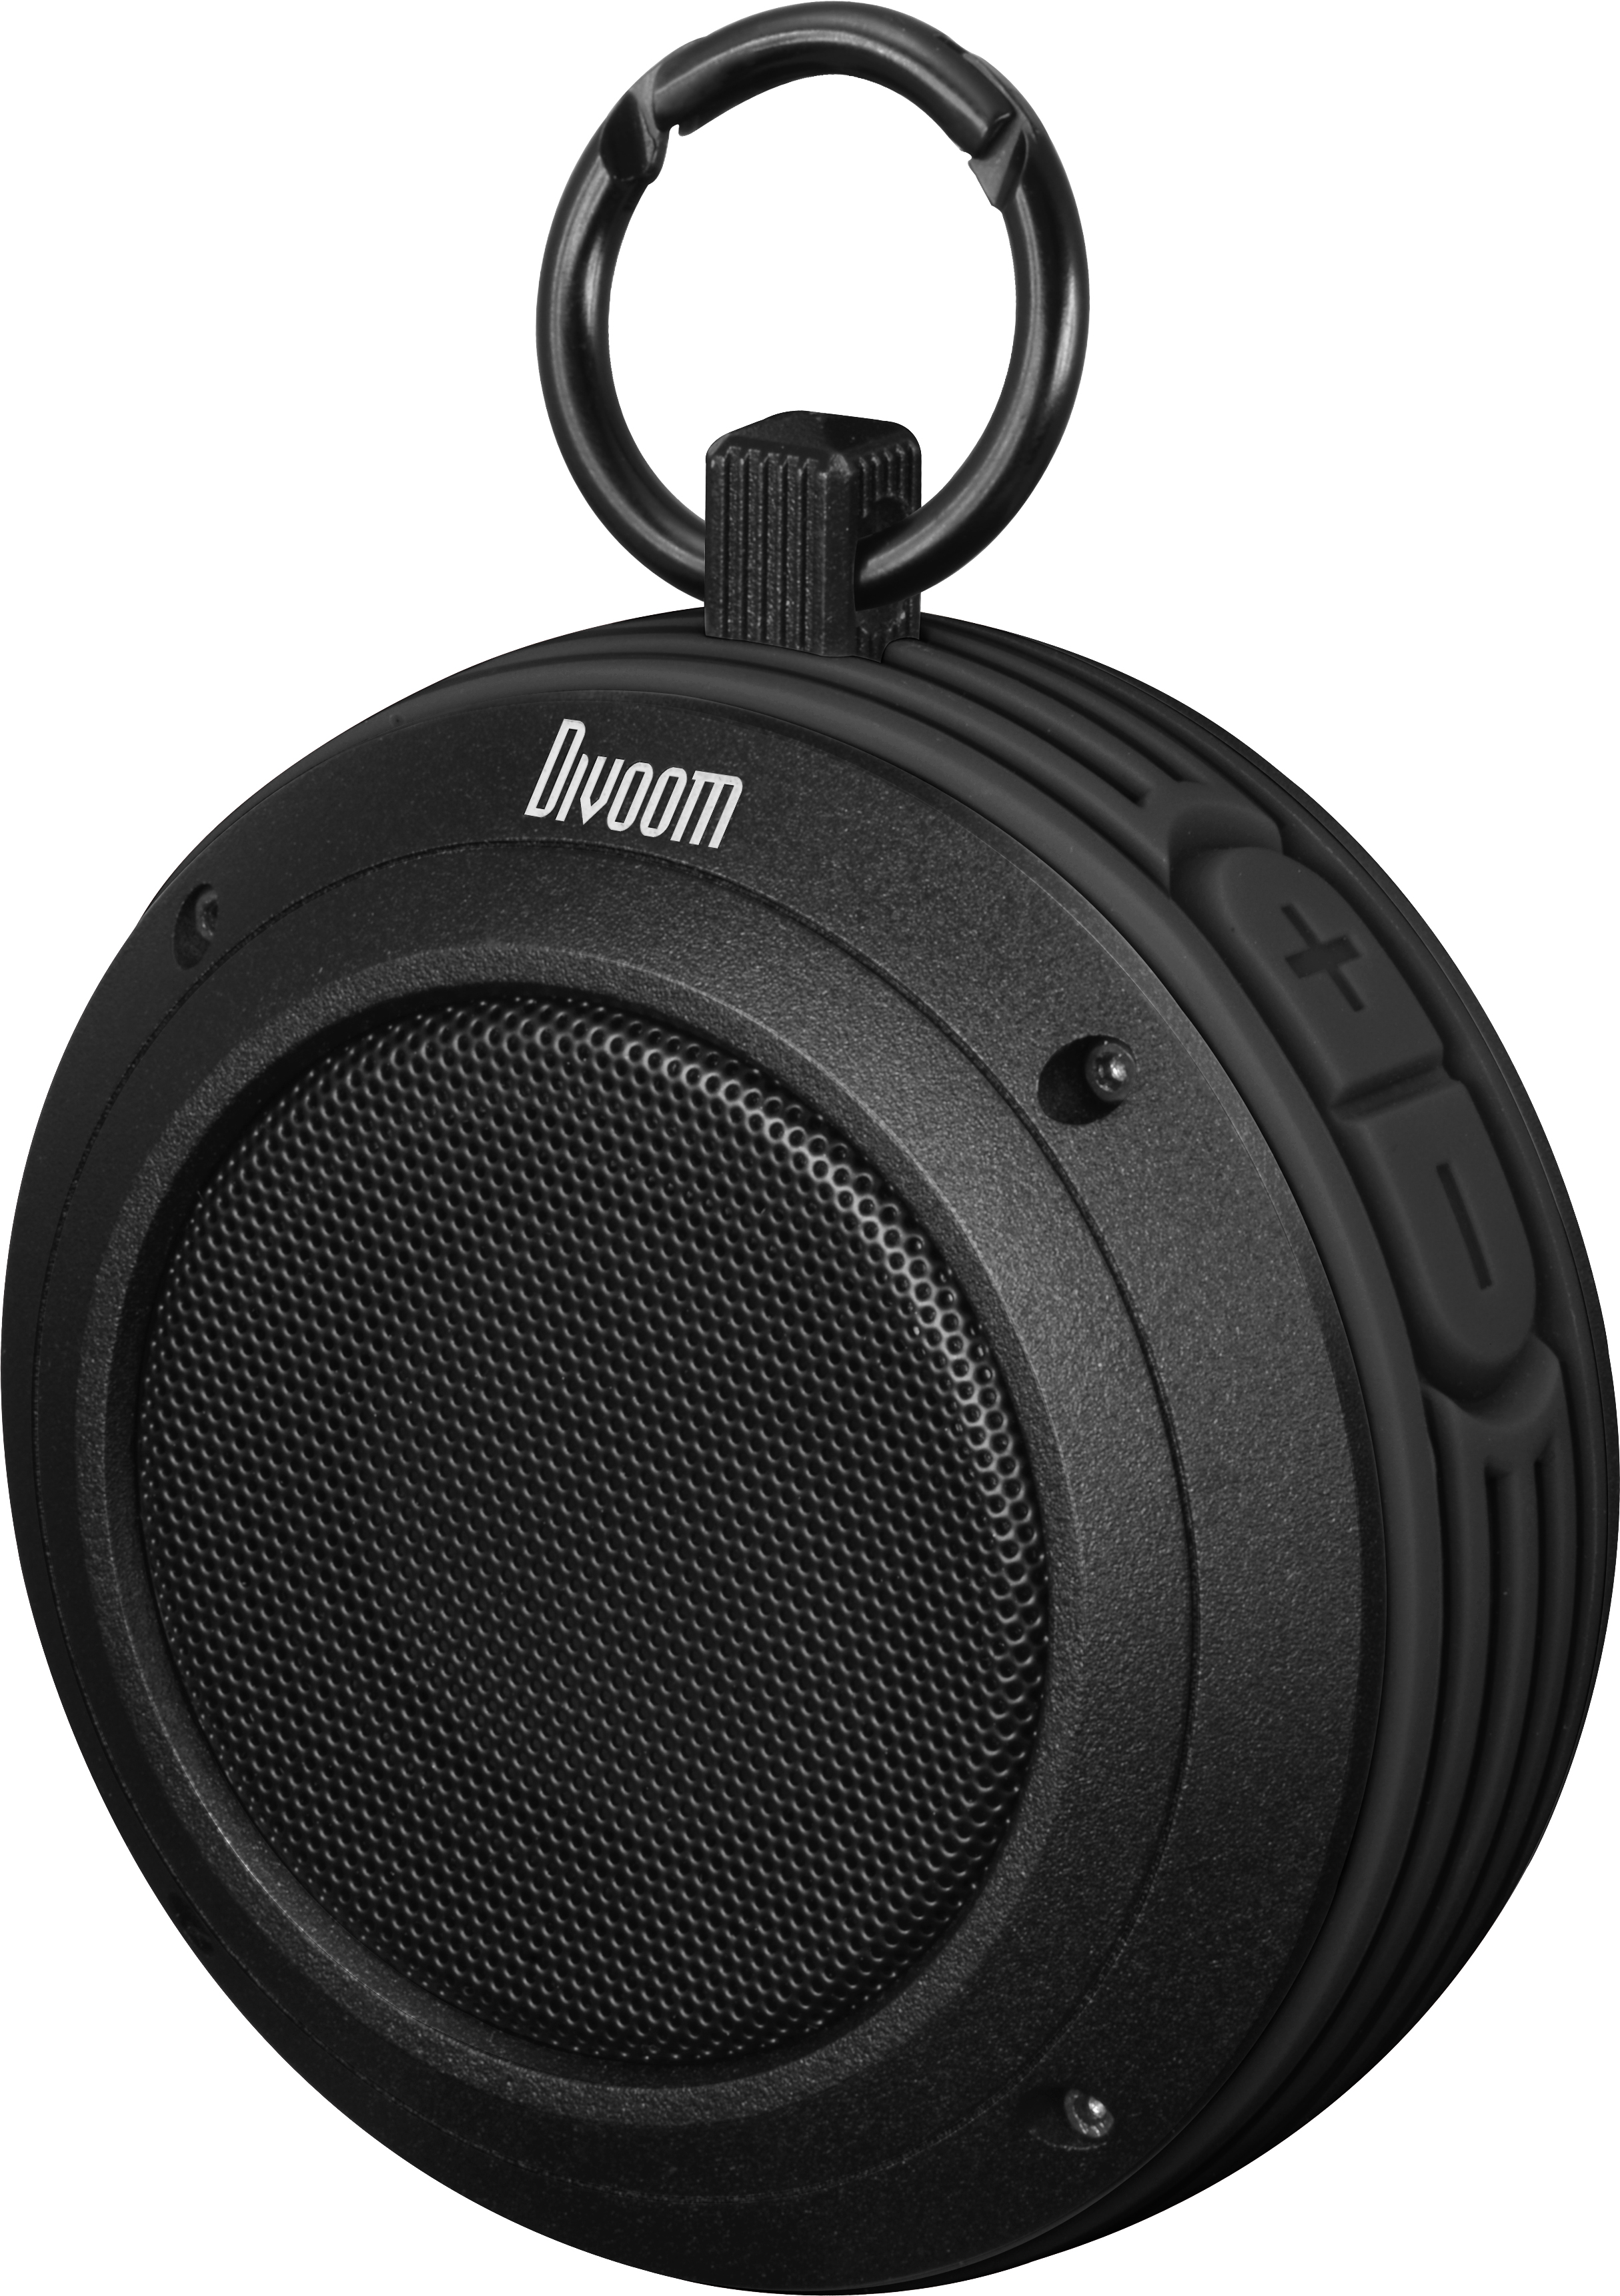 Divoom Voombox Travel Bluetooth 4.0 Speaker Black